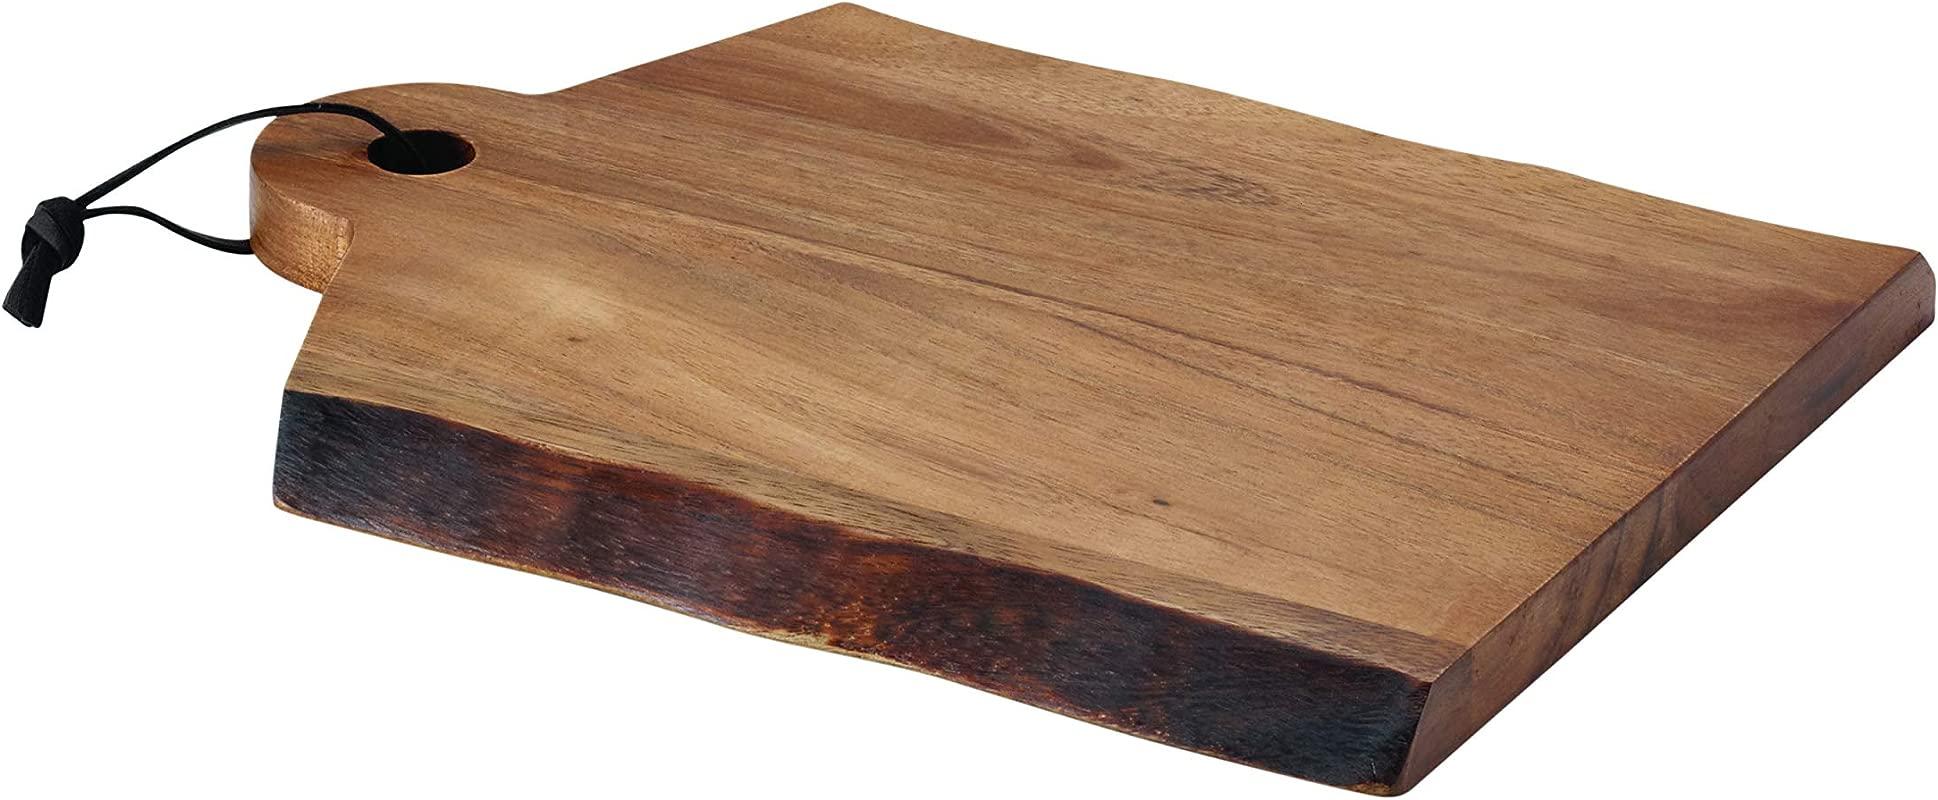 Rachael Ray Cucina Pantryware 14 Inch X 11 Inch Wood Cutting Board With Handle